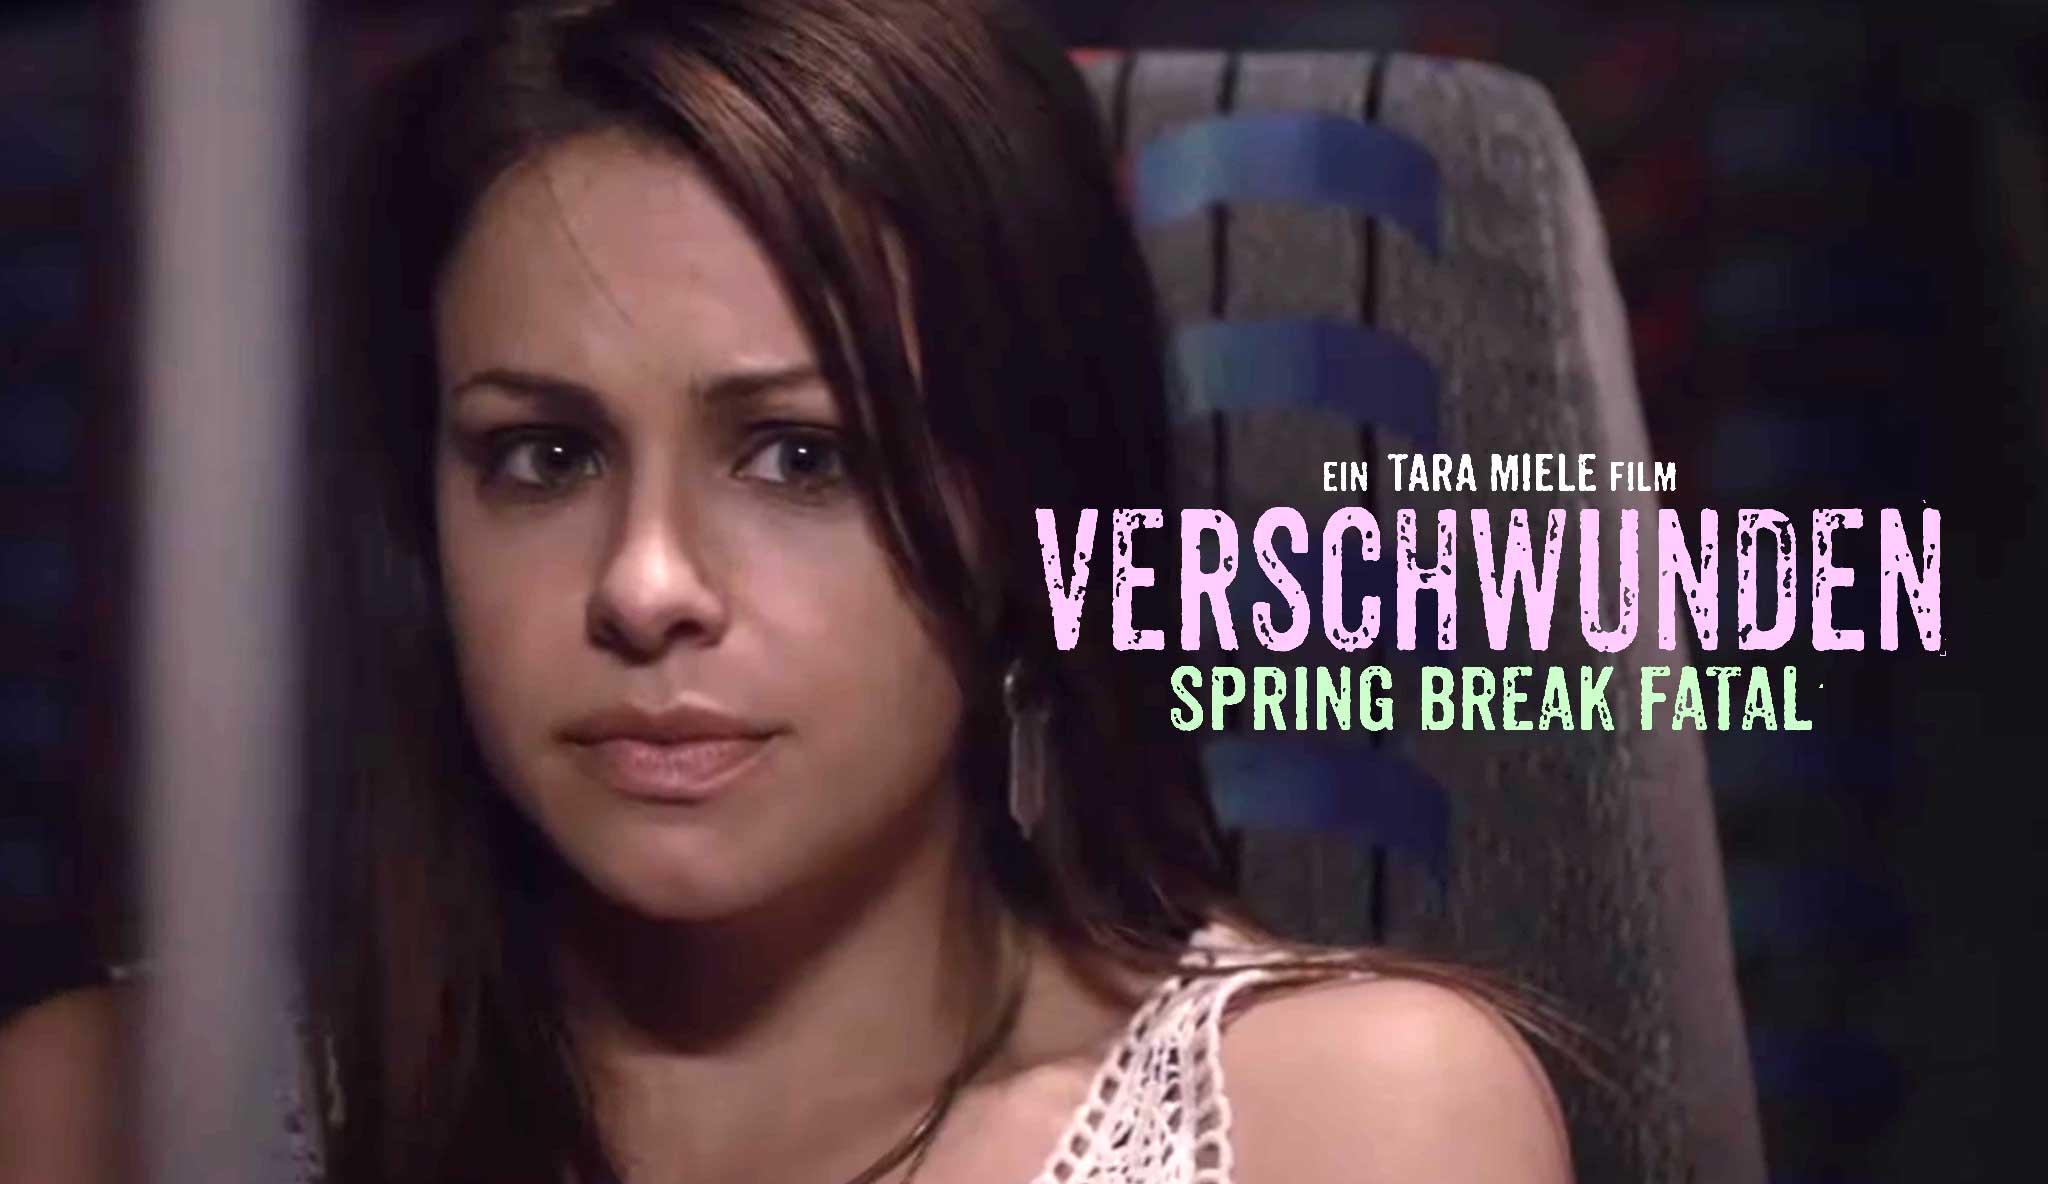 verschwunden-spring-break-fatal\header.jpg